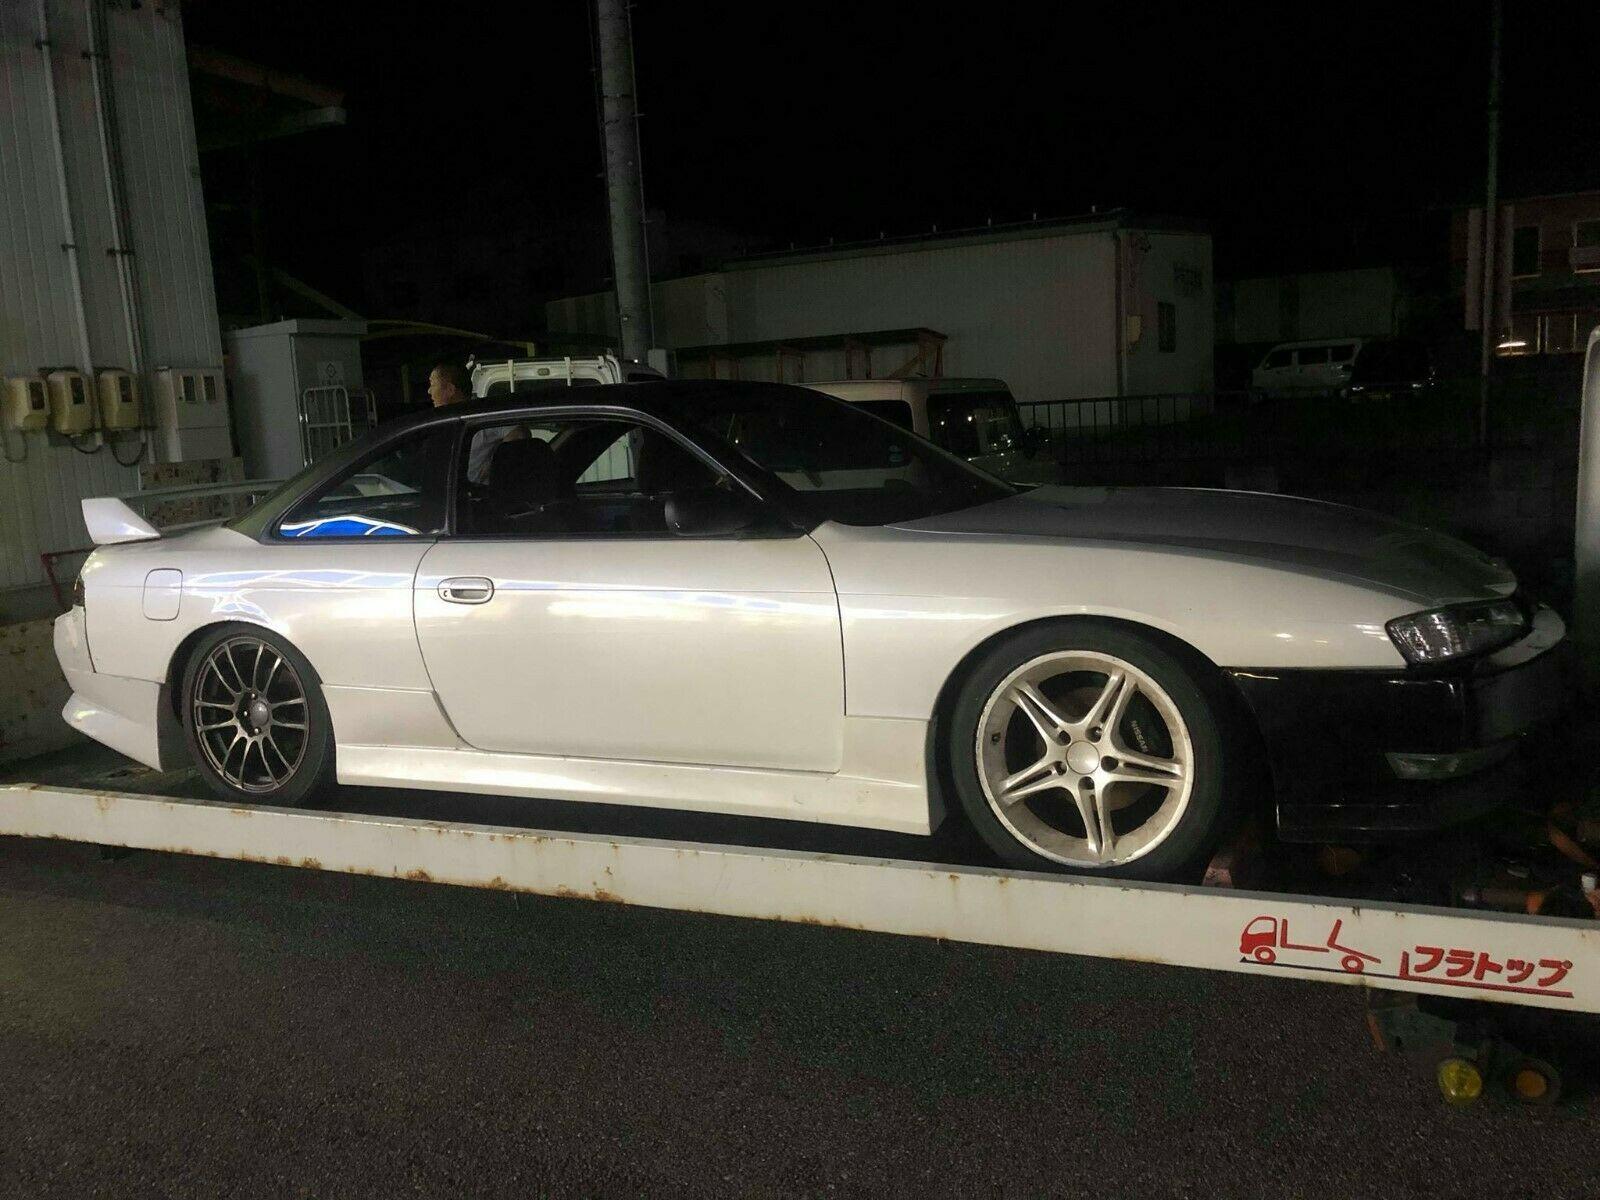 Nissan Silvia S14a Kouki 200sx SR20det Turbo Import JDM Driftcar Track car  Zenki